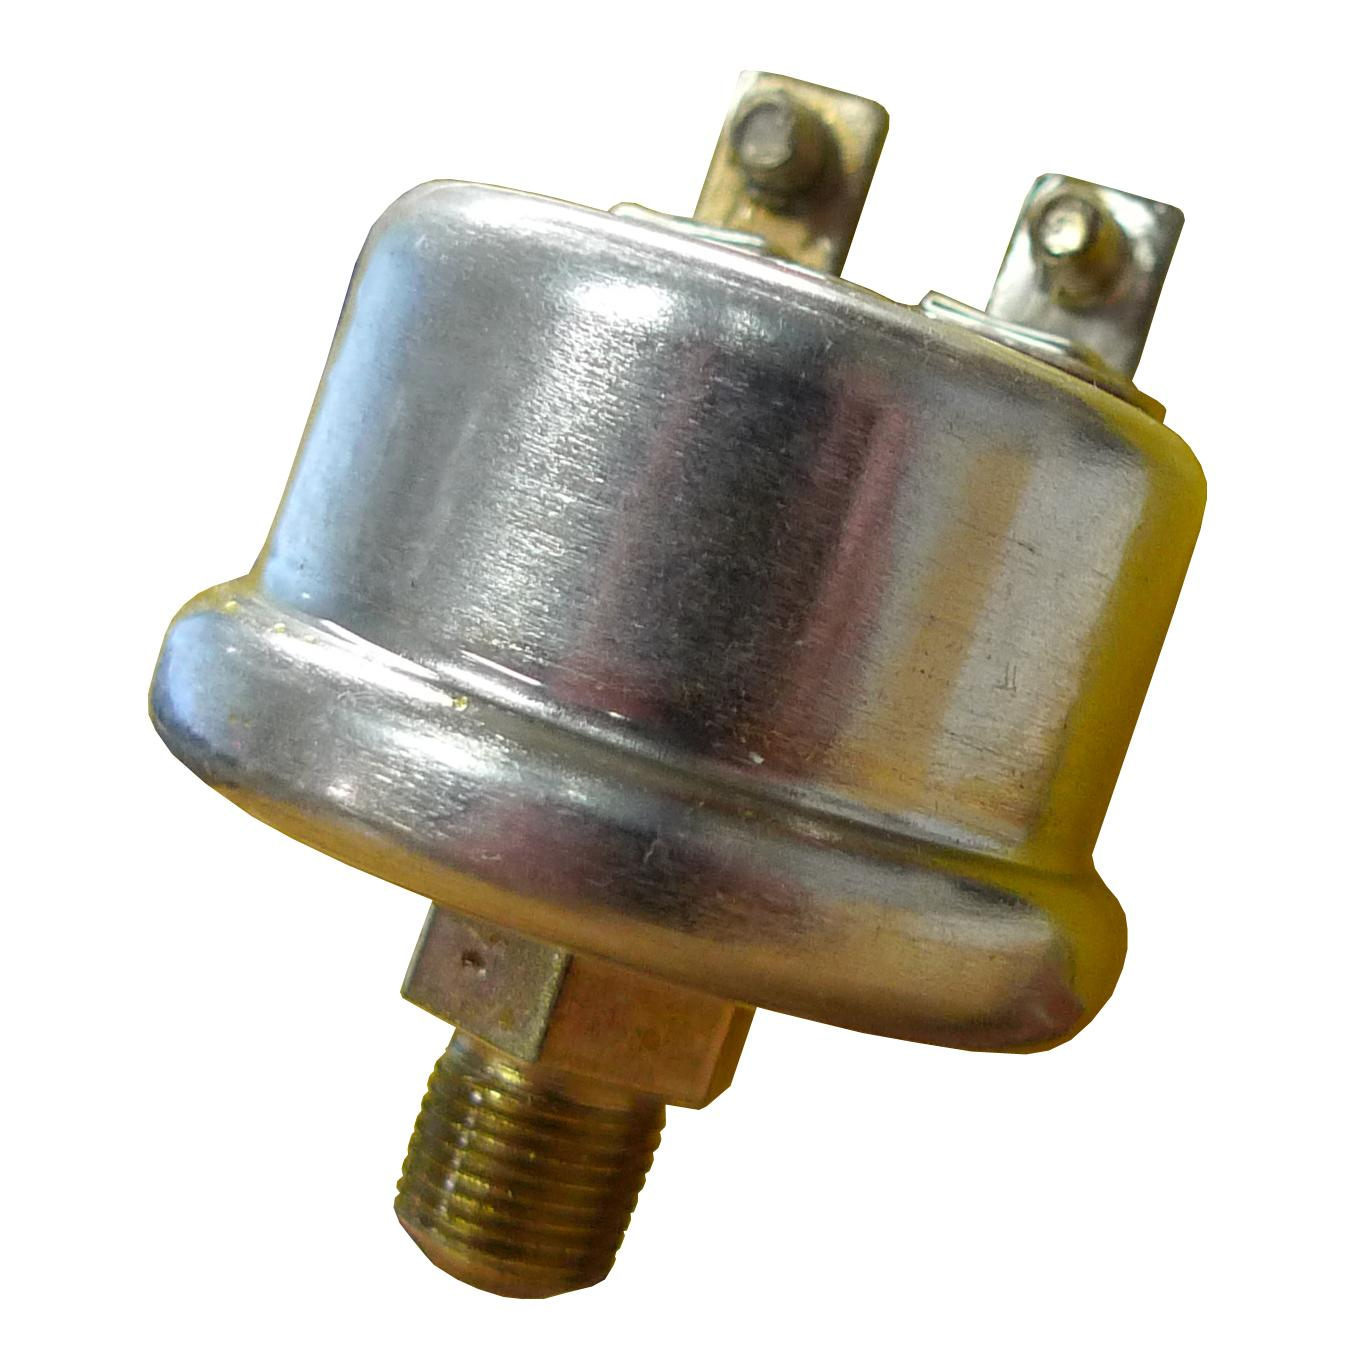 Fuel Pump Cut Off Switch Location